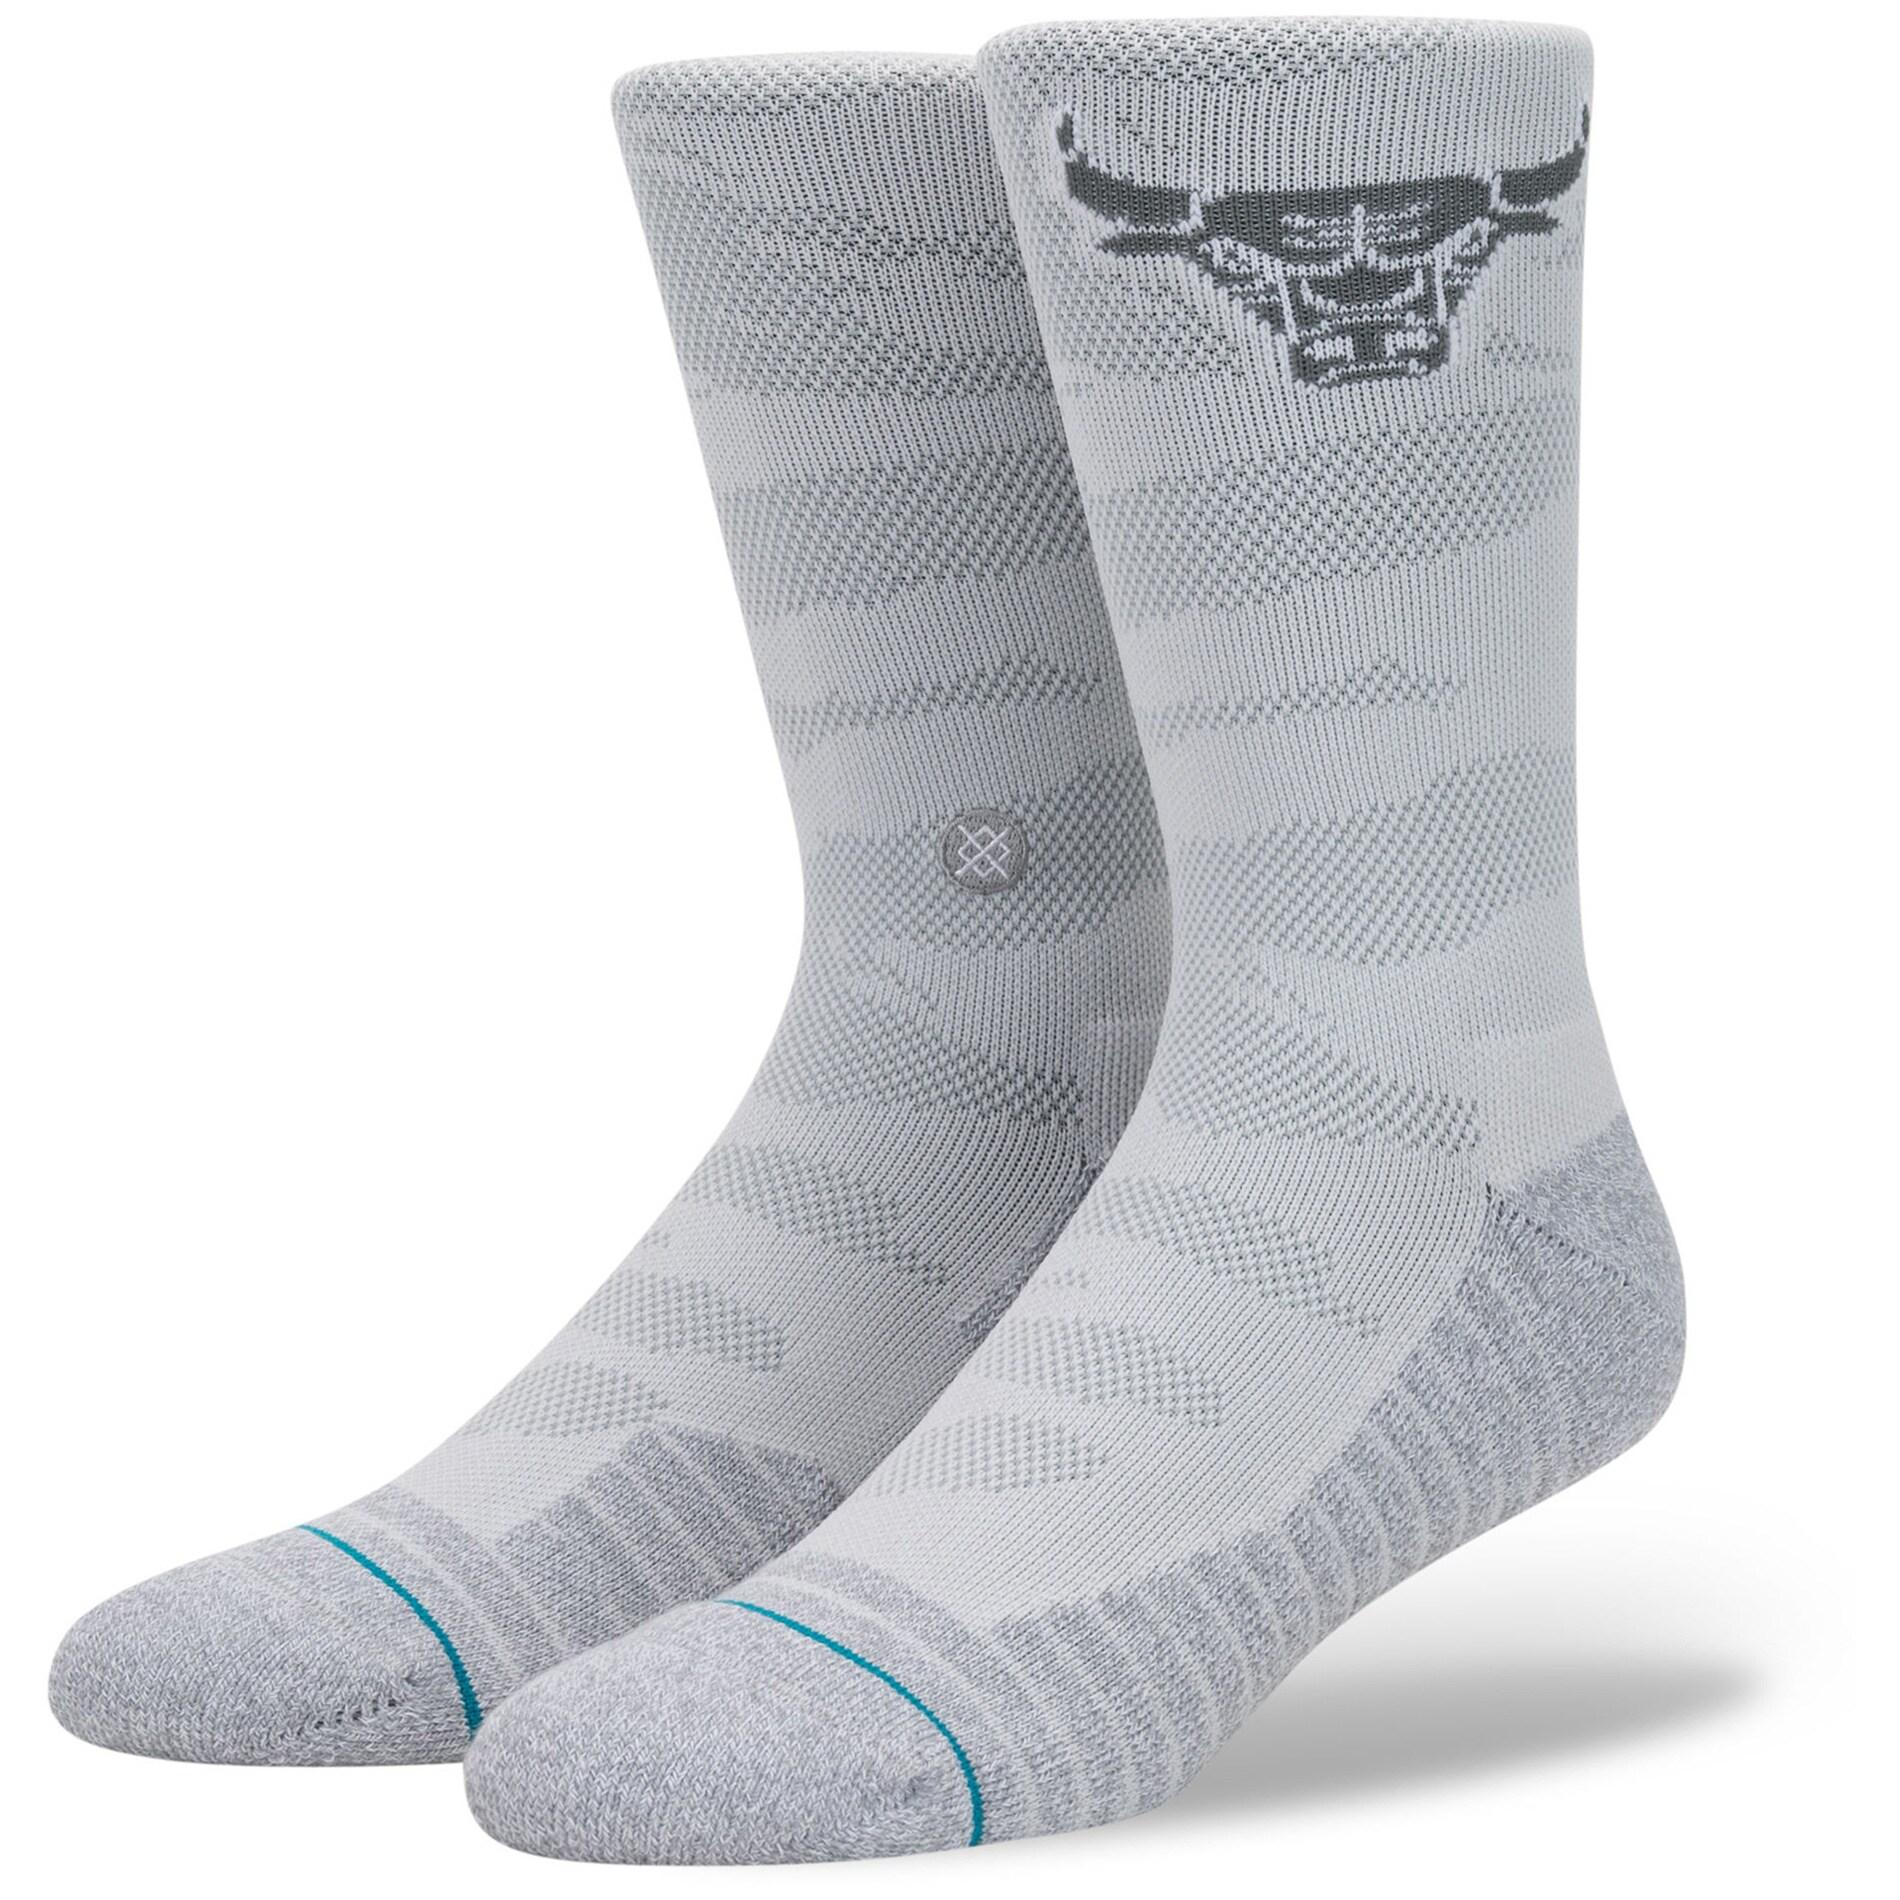 Chicago Bulls Stance Snow Camo Crew Sock - Gray